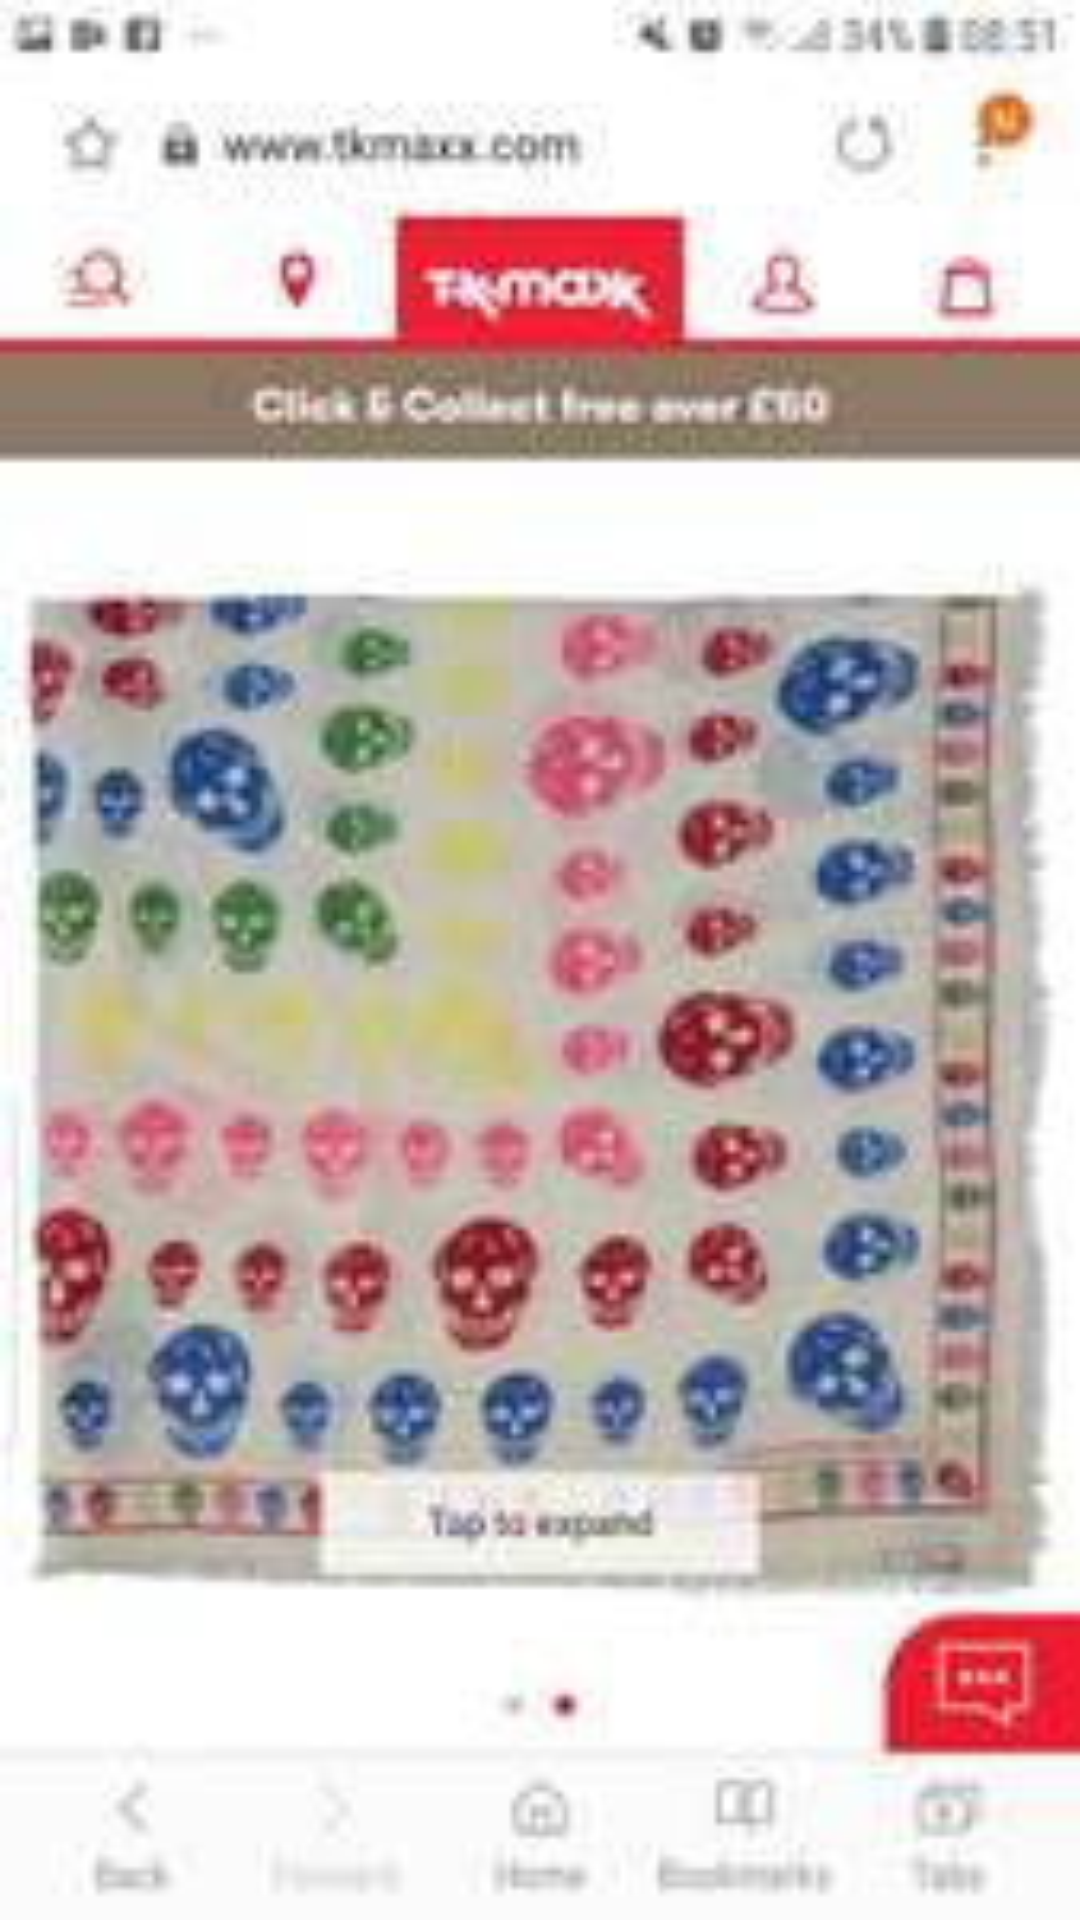 Alexander Mcqueen Skull wool blend scarf  £129.99 TkMaxx